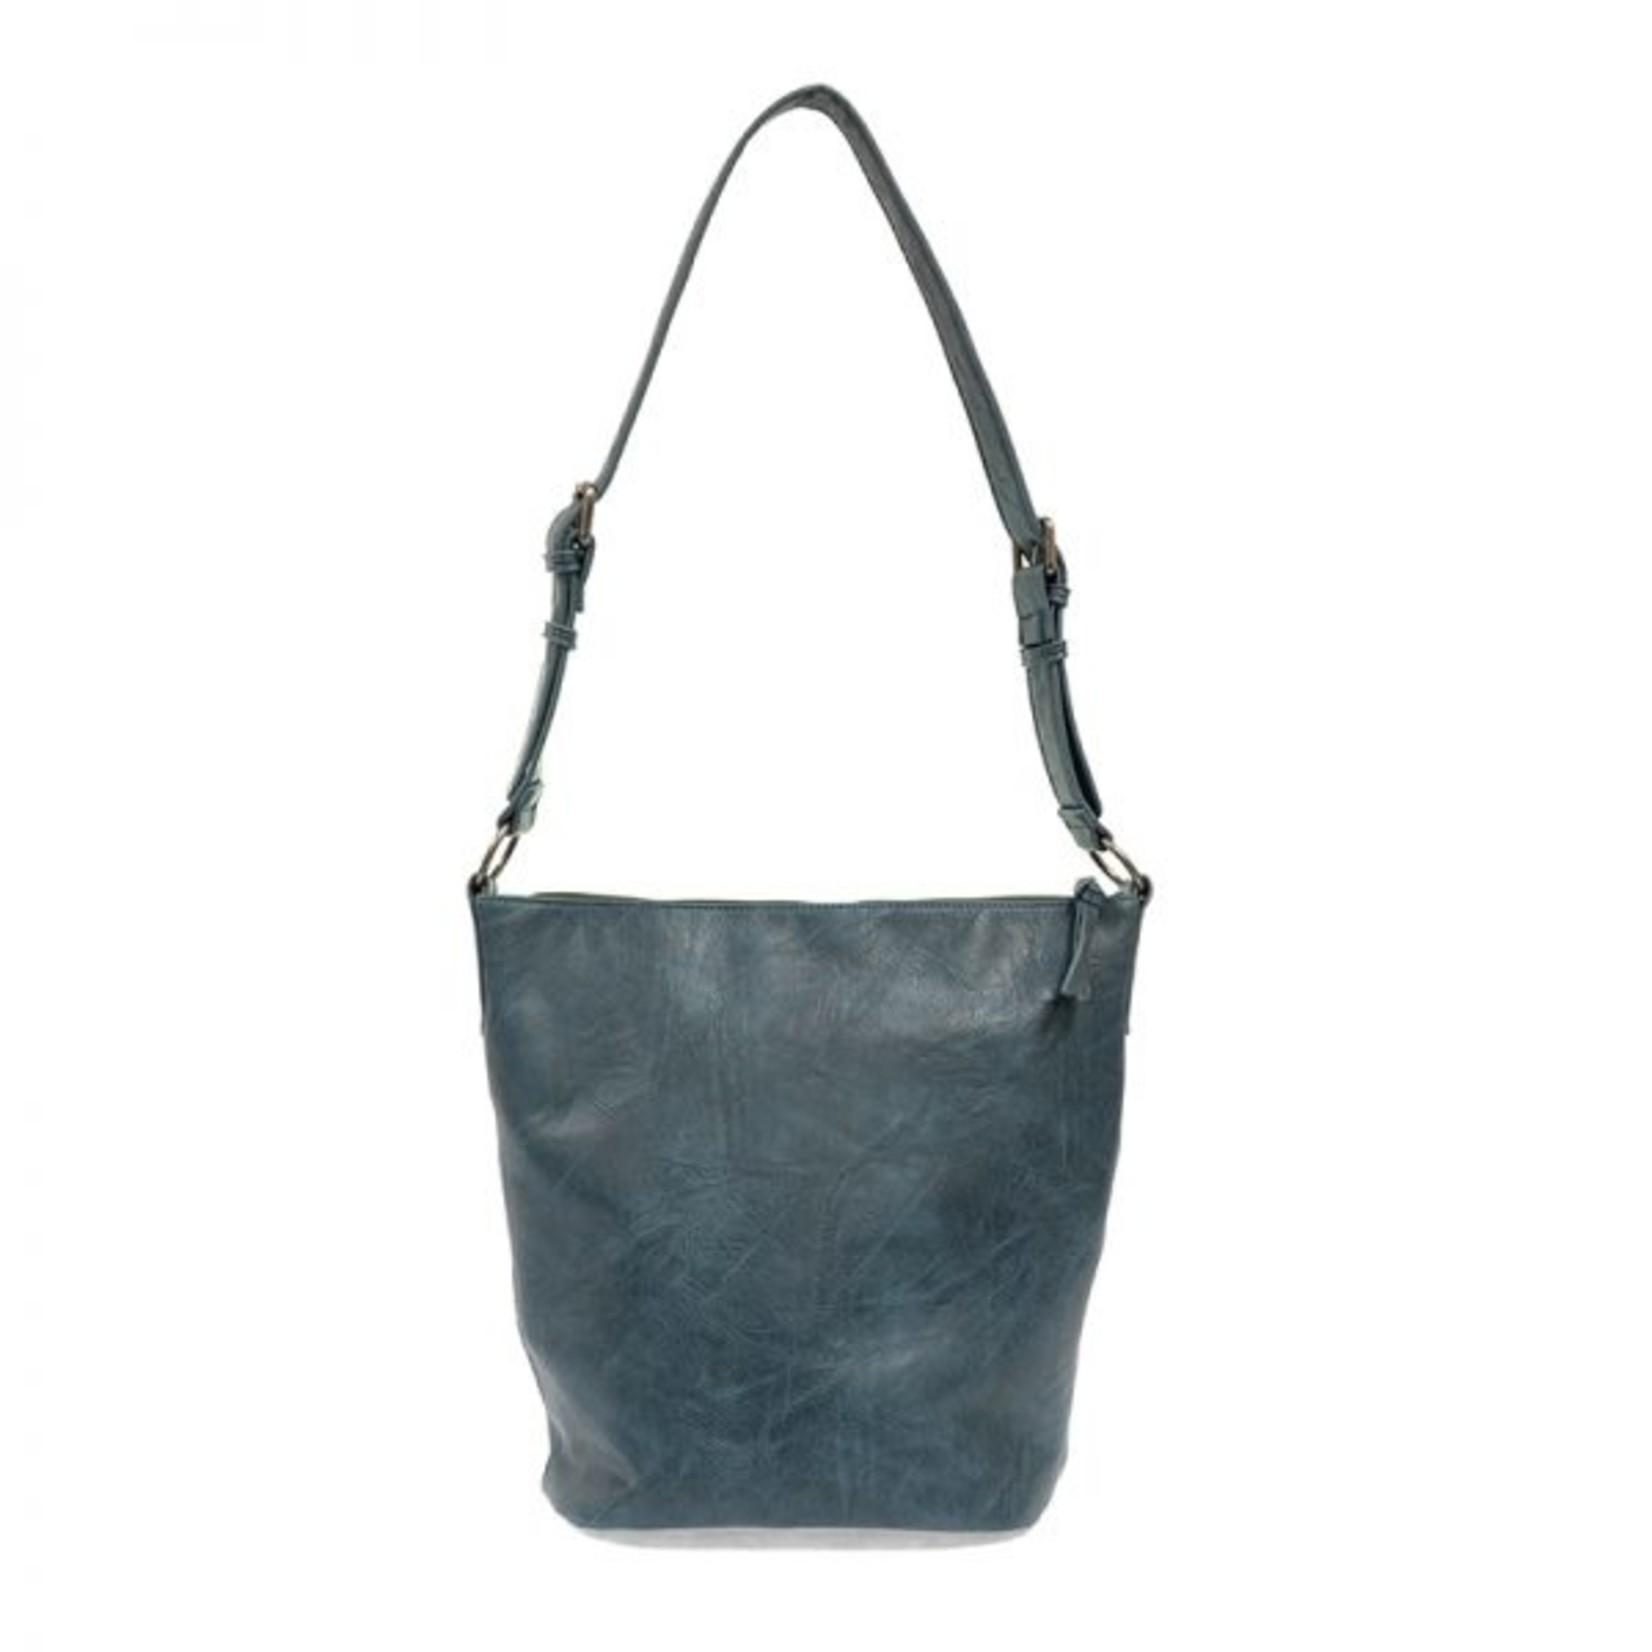 Nori Crossbody Bucket Collection